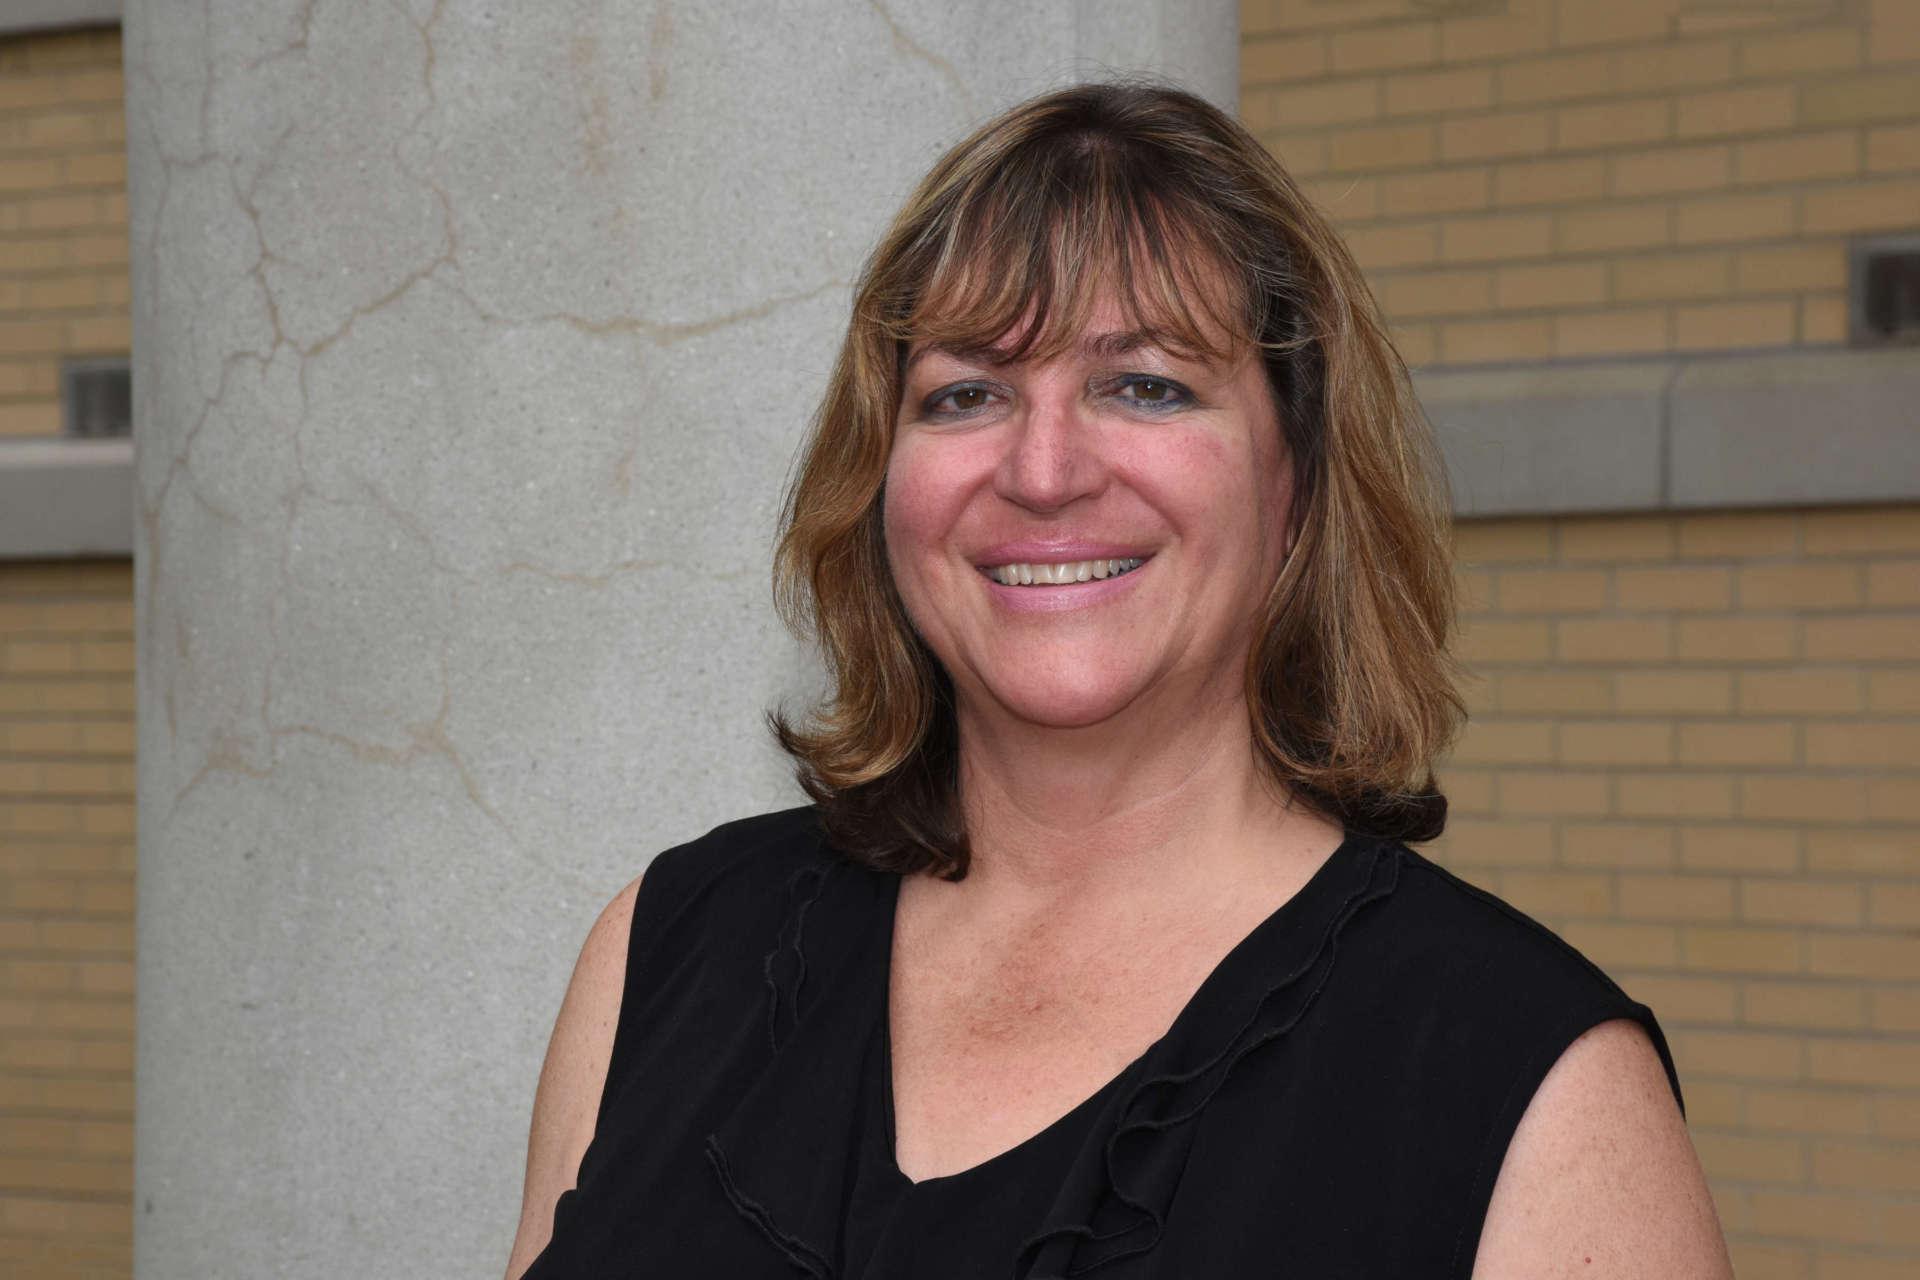 Dr. Heidi Dobish